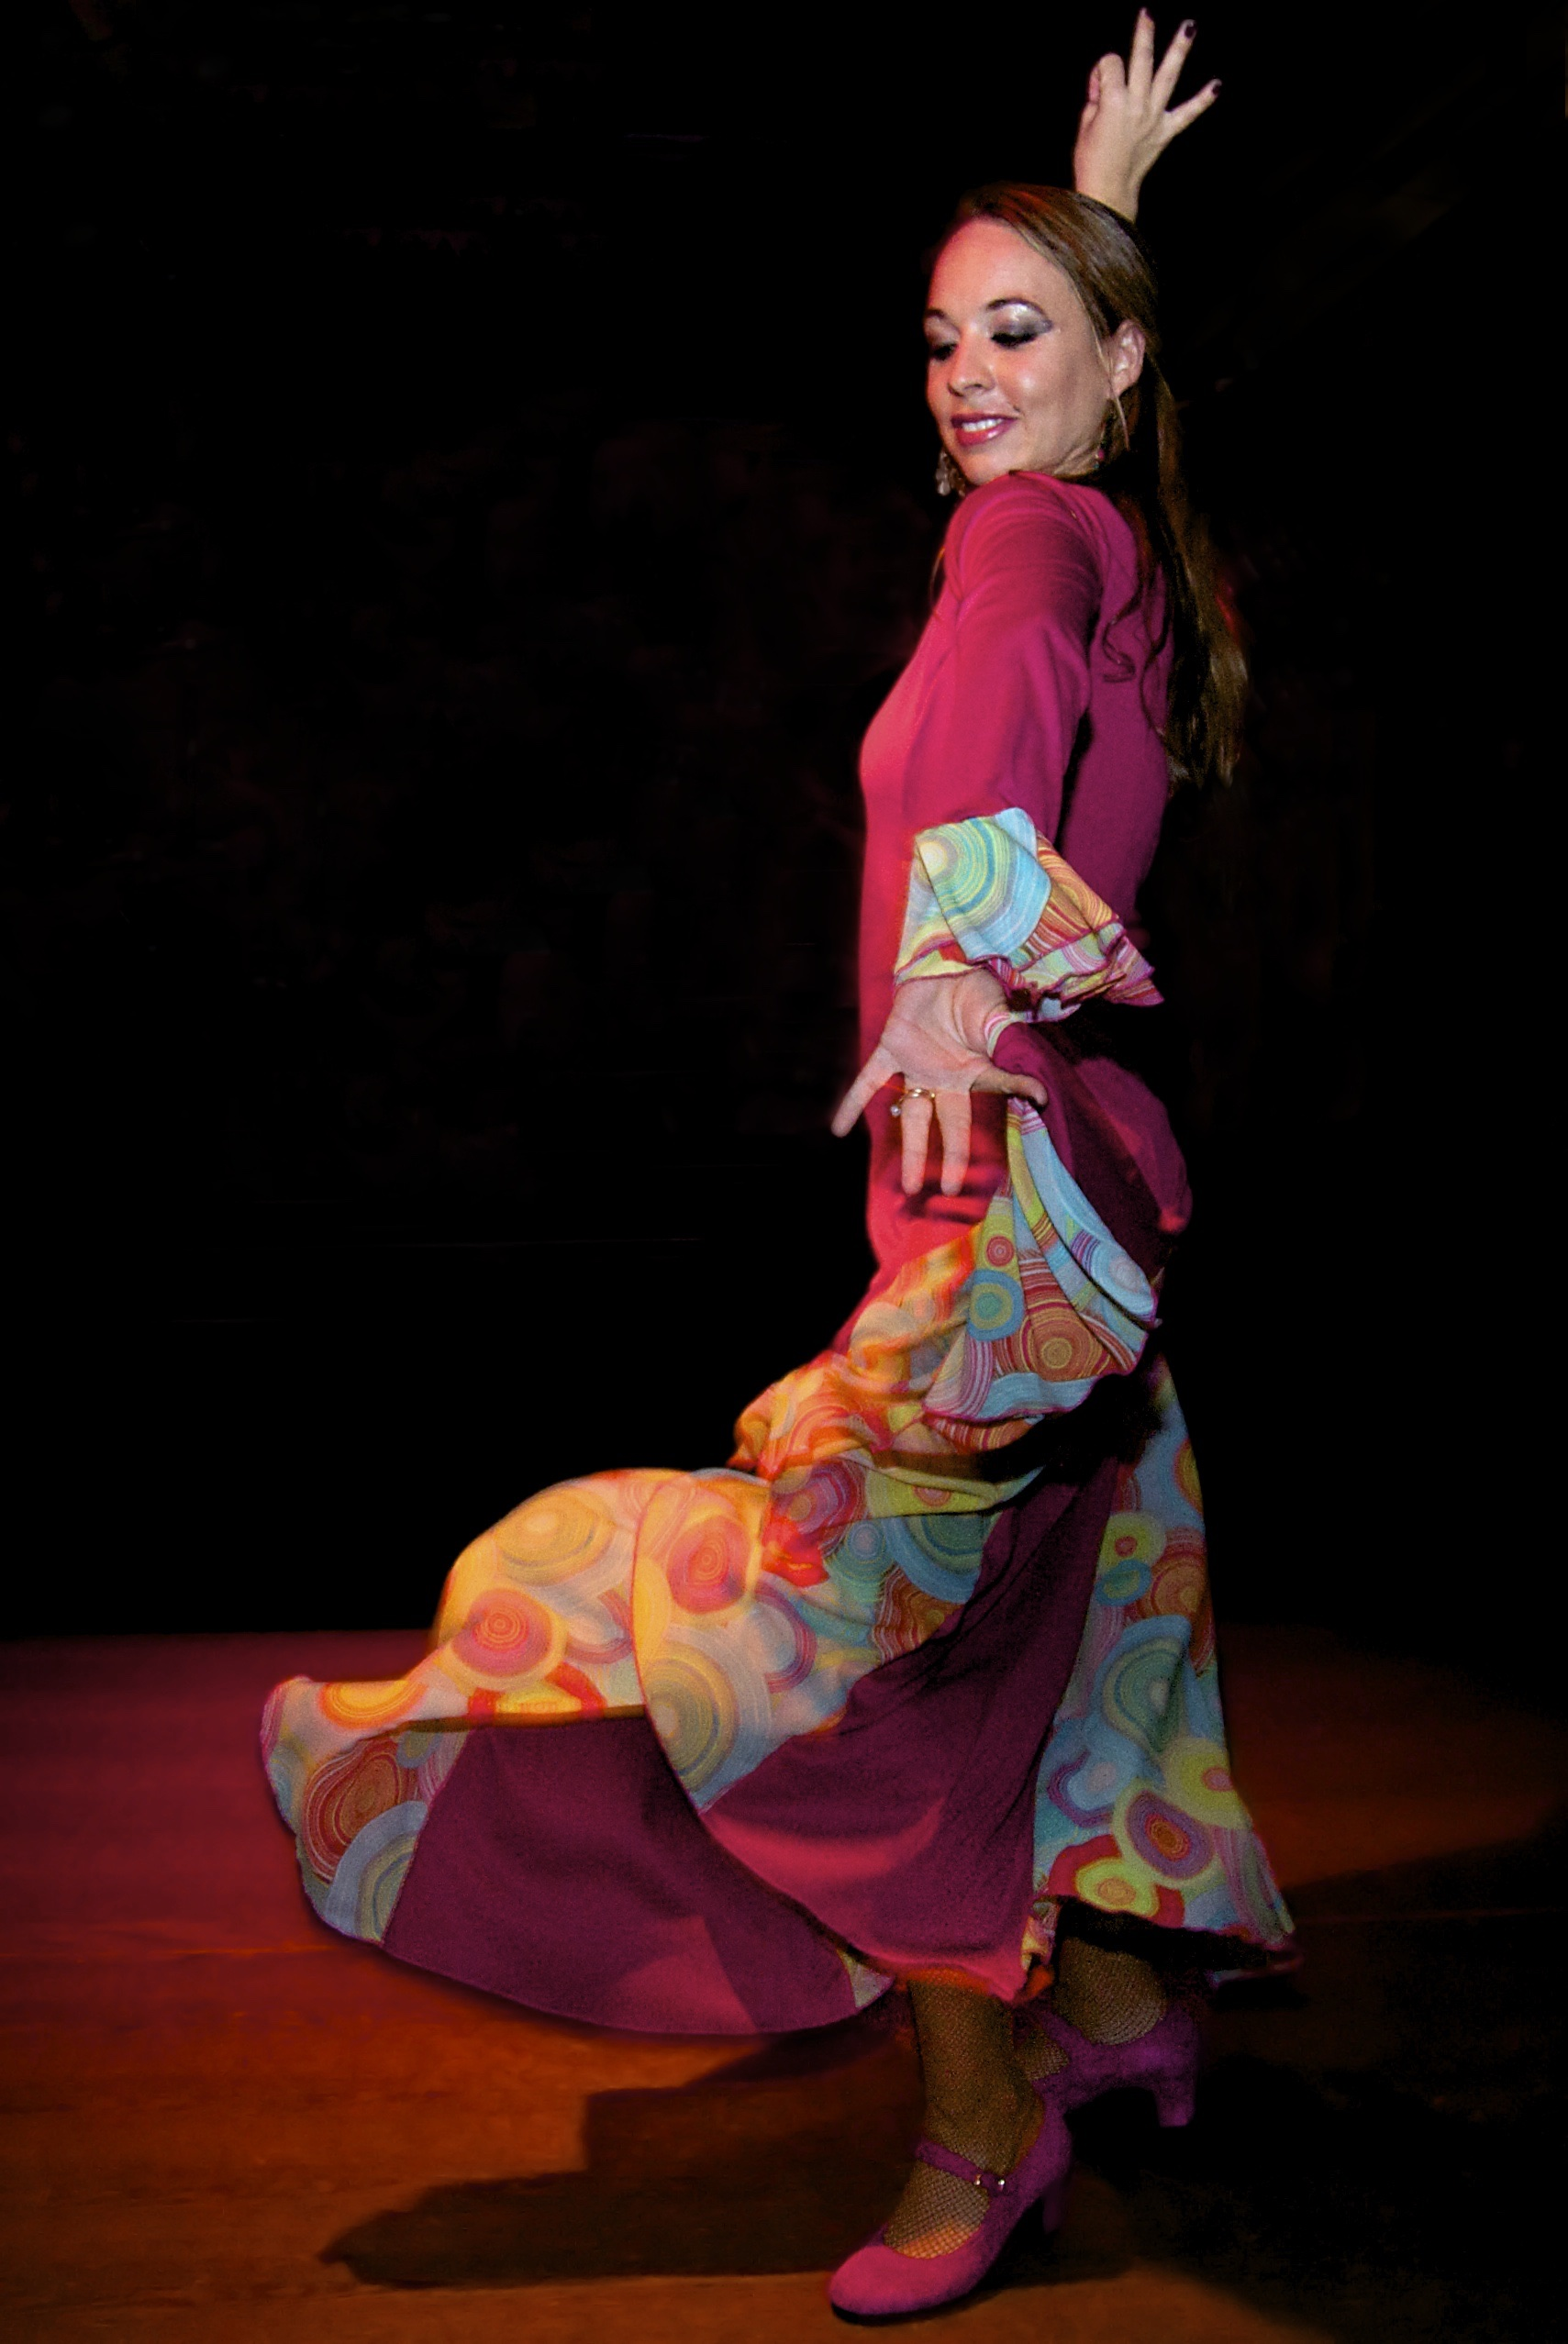 vanessa-12-08-2011-flamenco-33427-alt-version.jpg